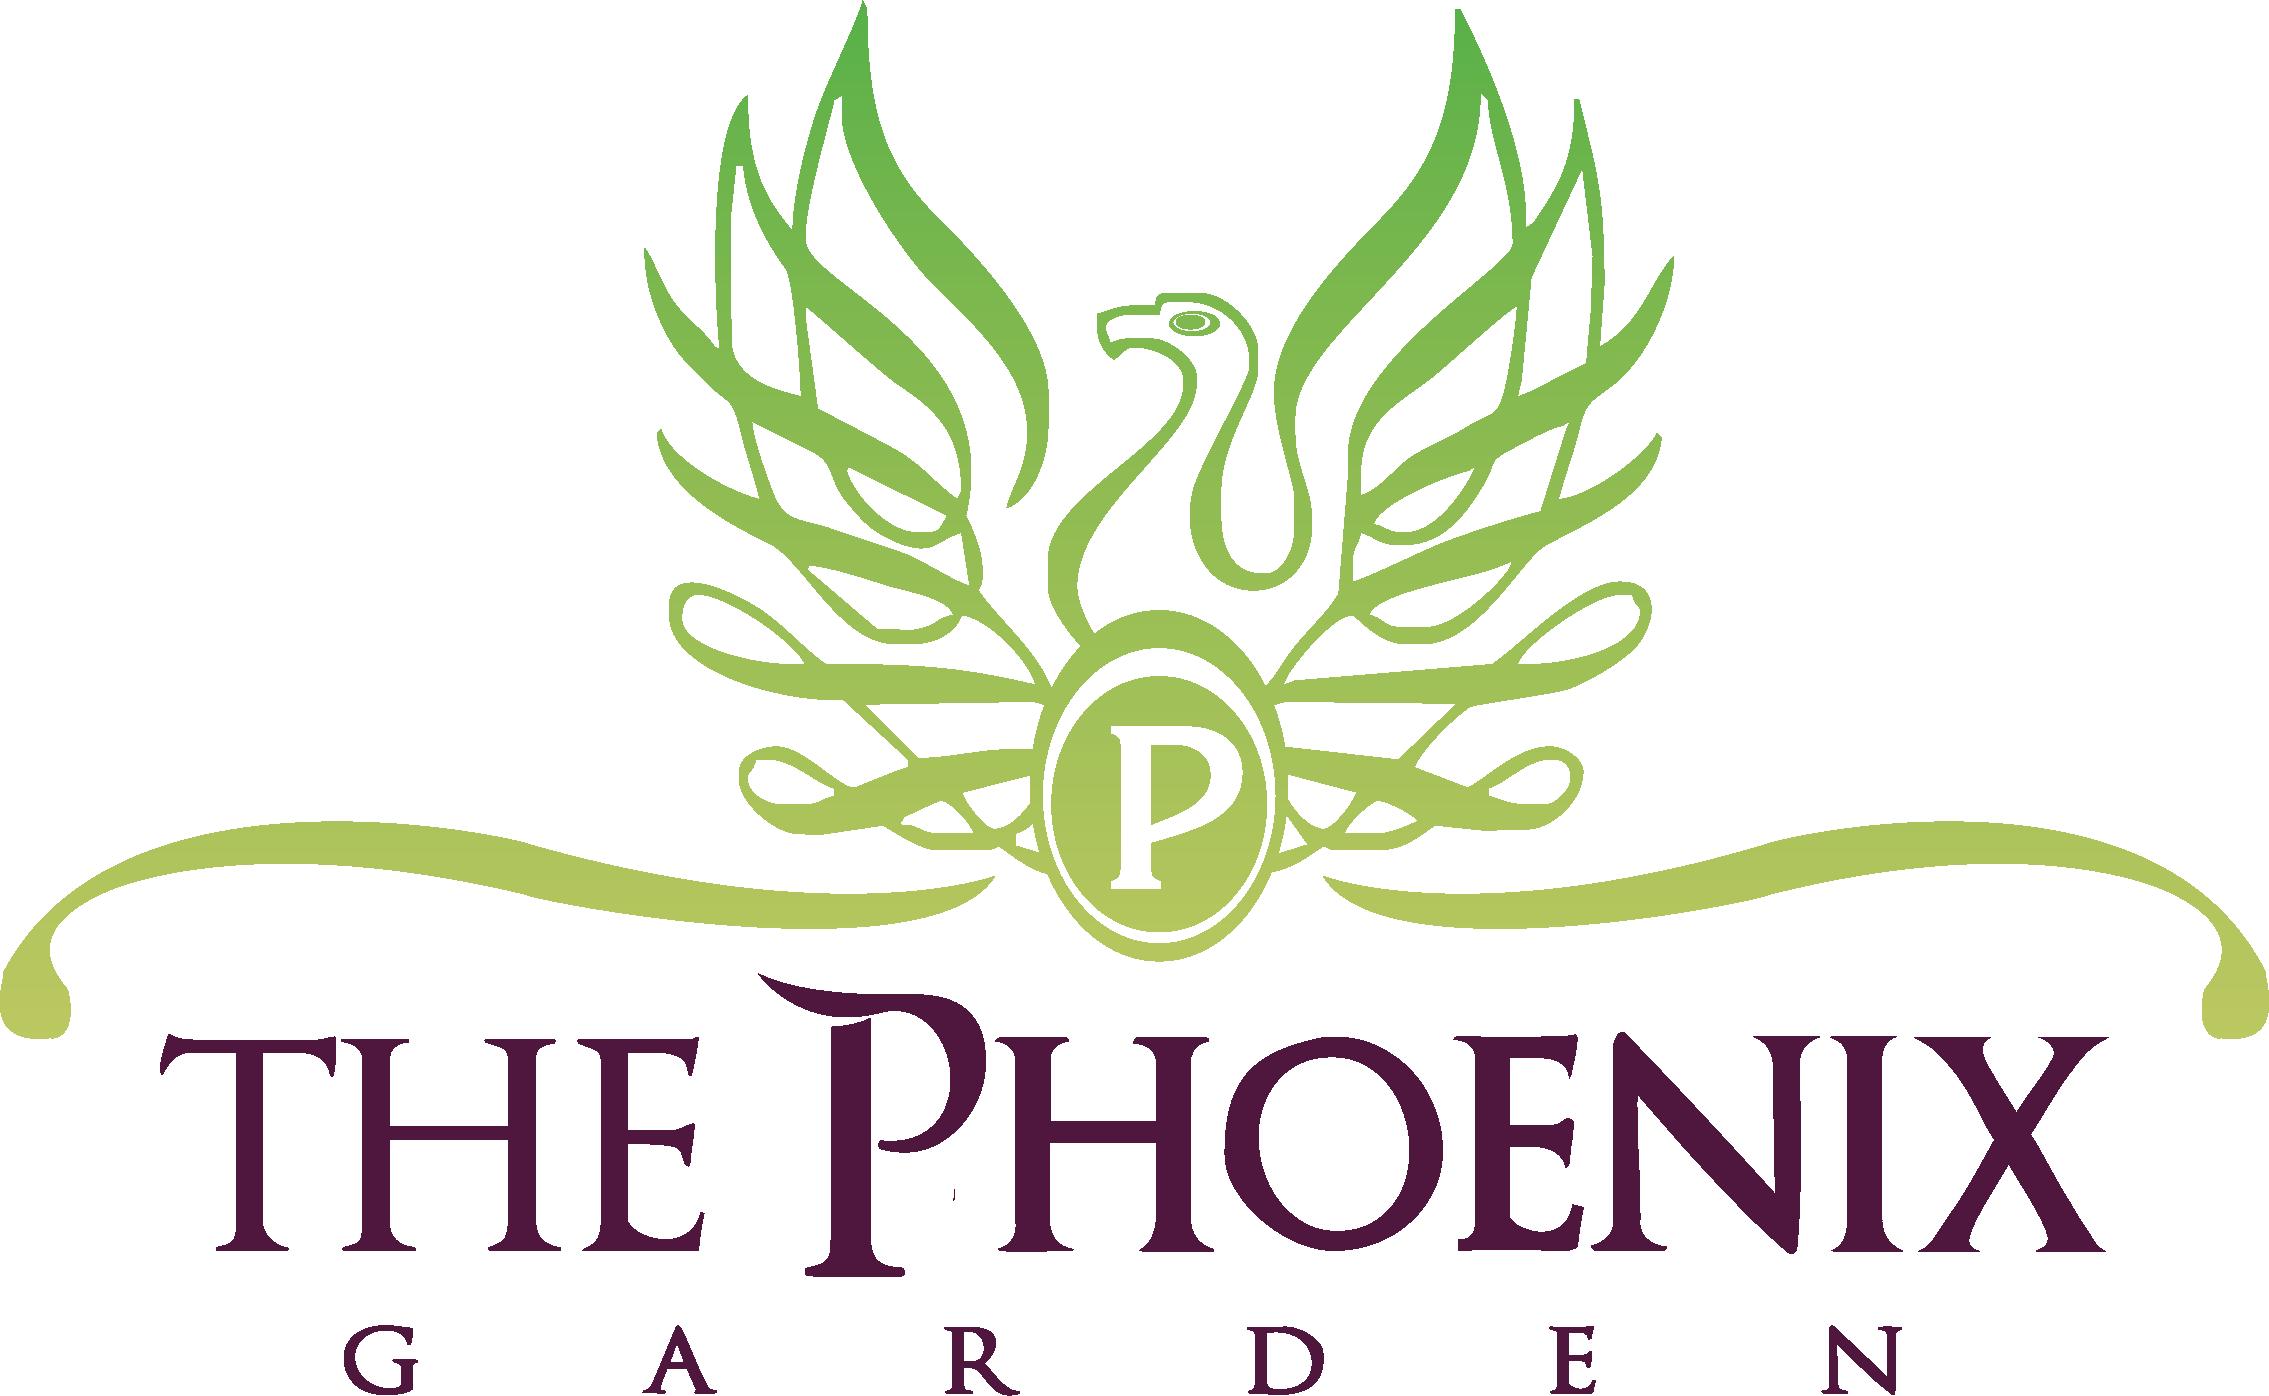 Biệt thự The Phoenix Garden